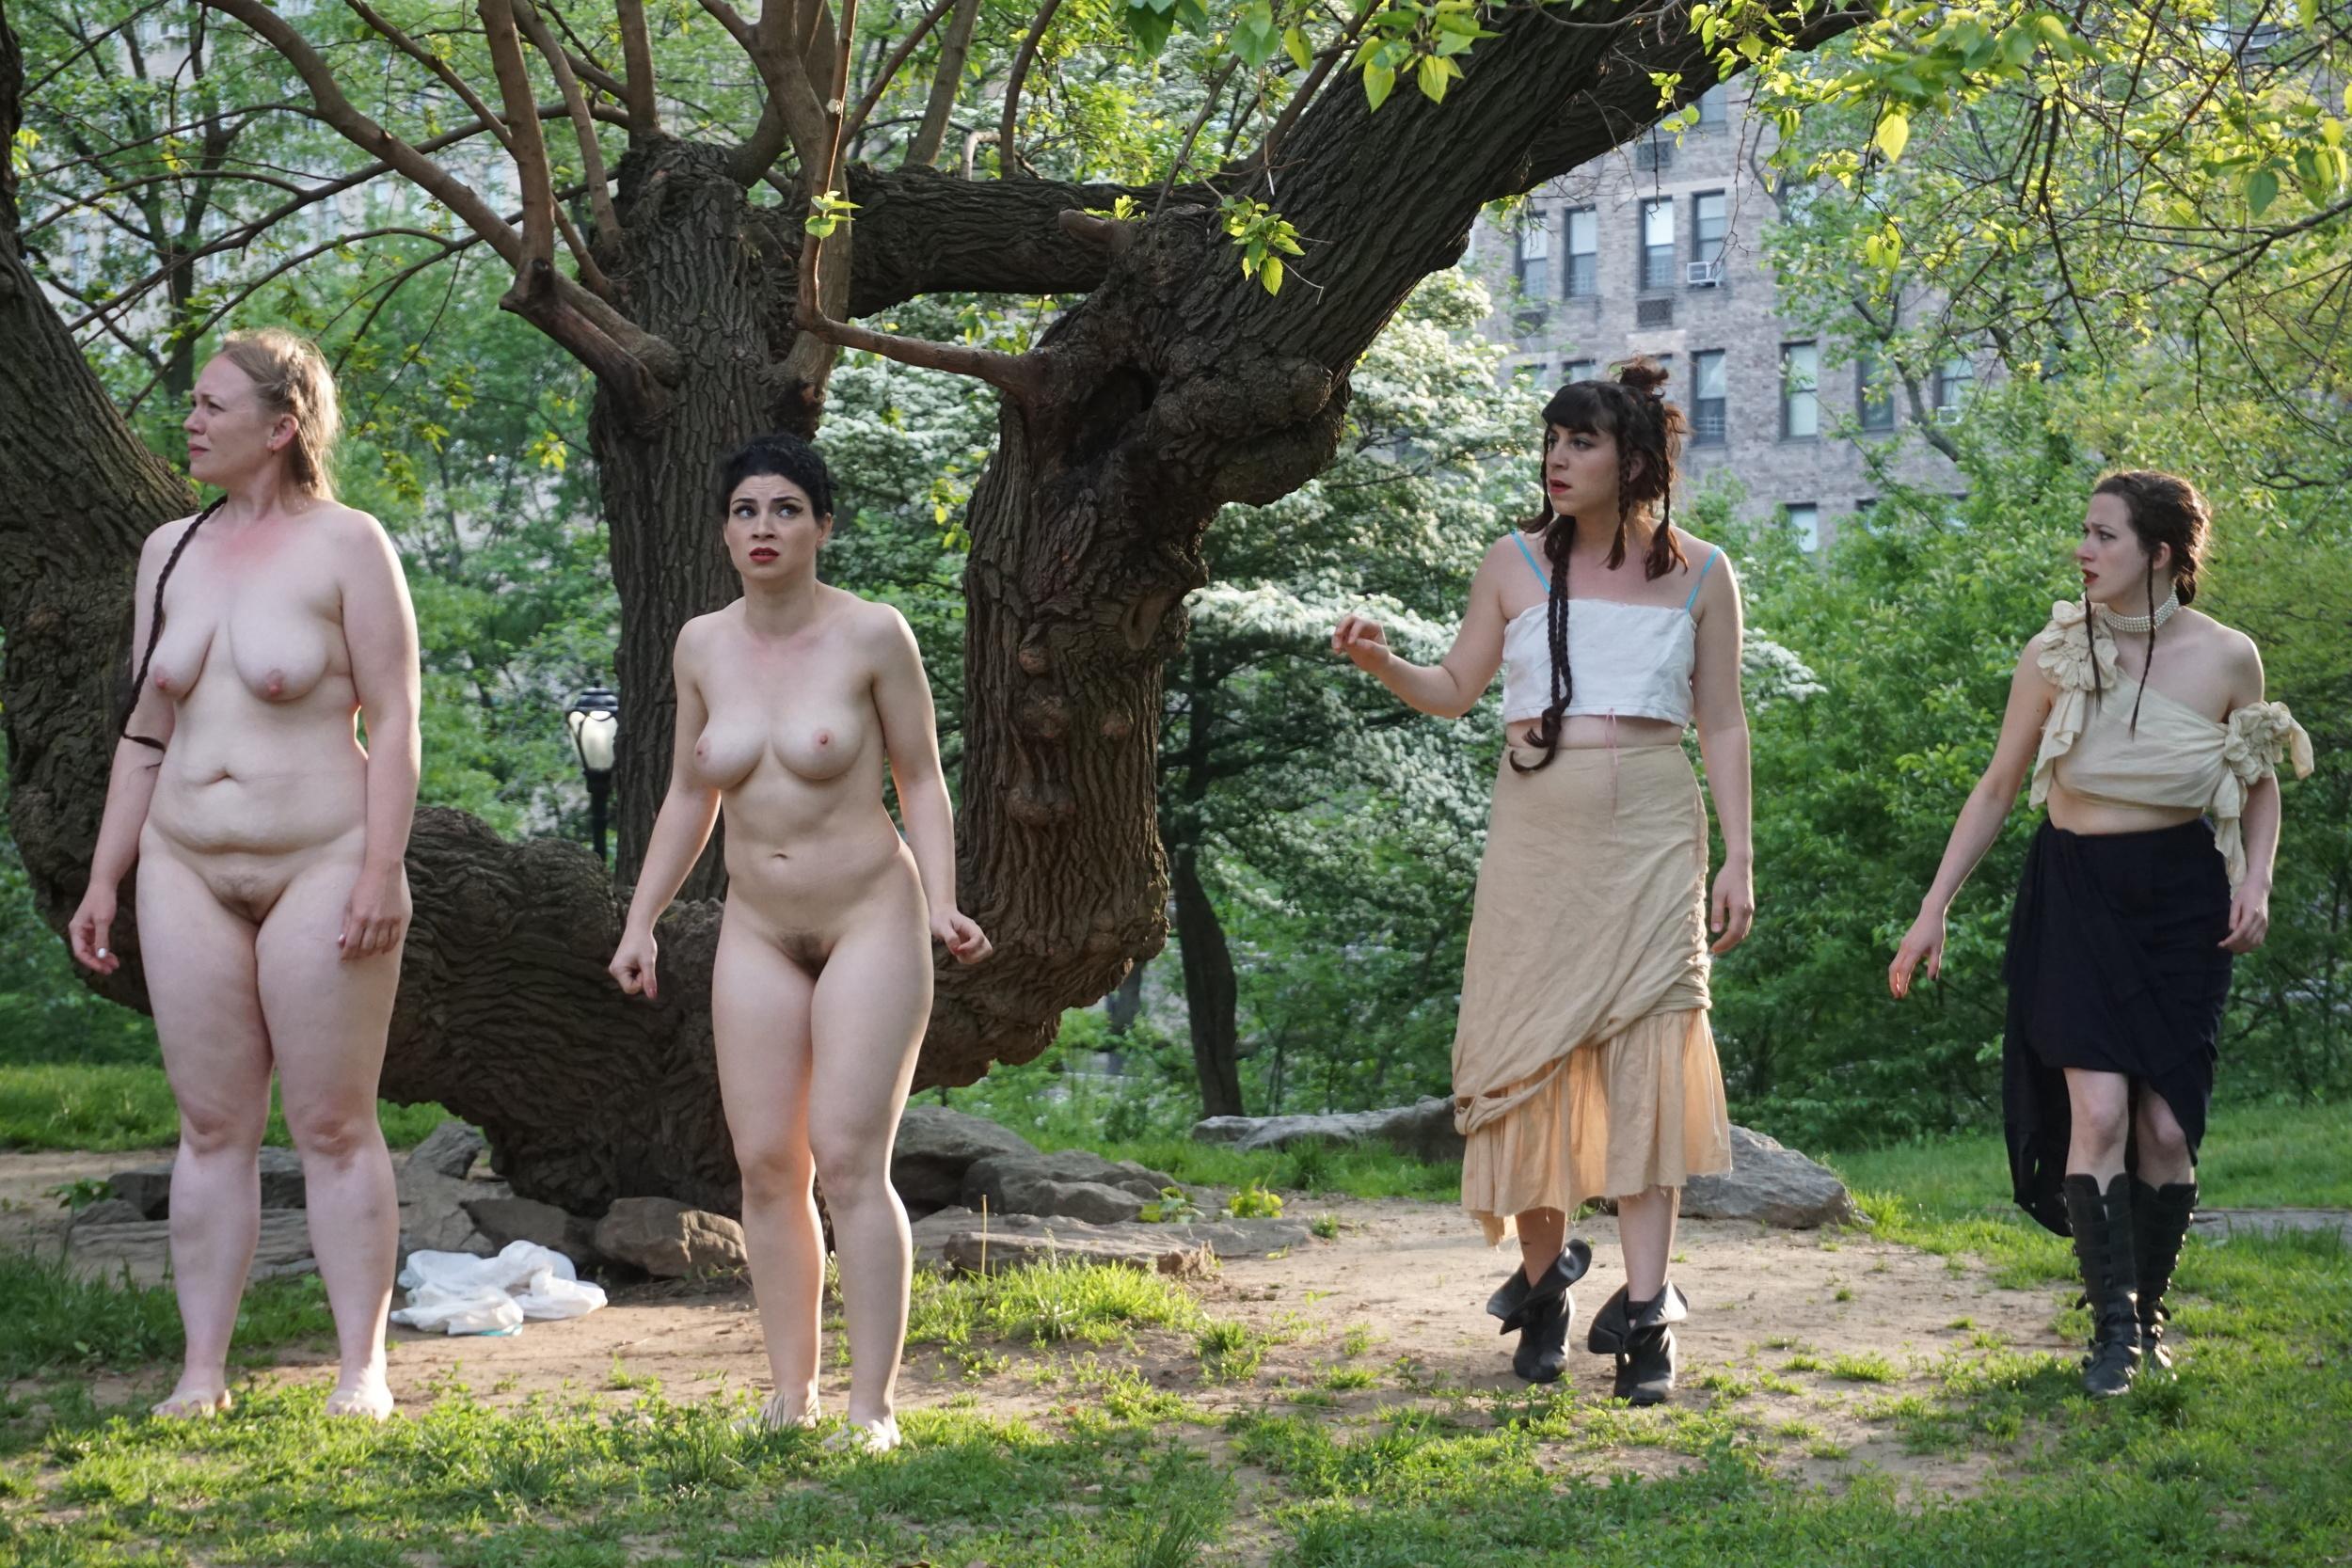 Layne Tisdel Martin, Sarah Sutliff, Suzannah Gratz, and Clara Kundin. Photo by Valerie Pinkerton.